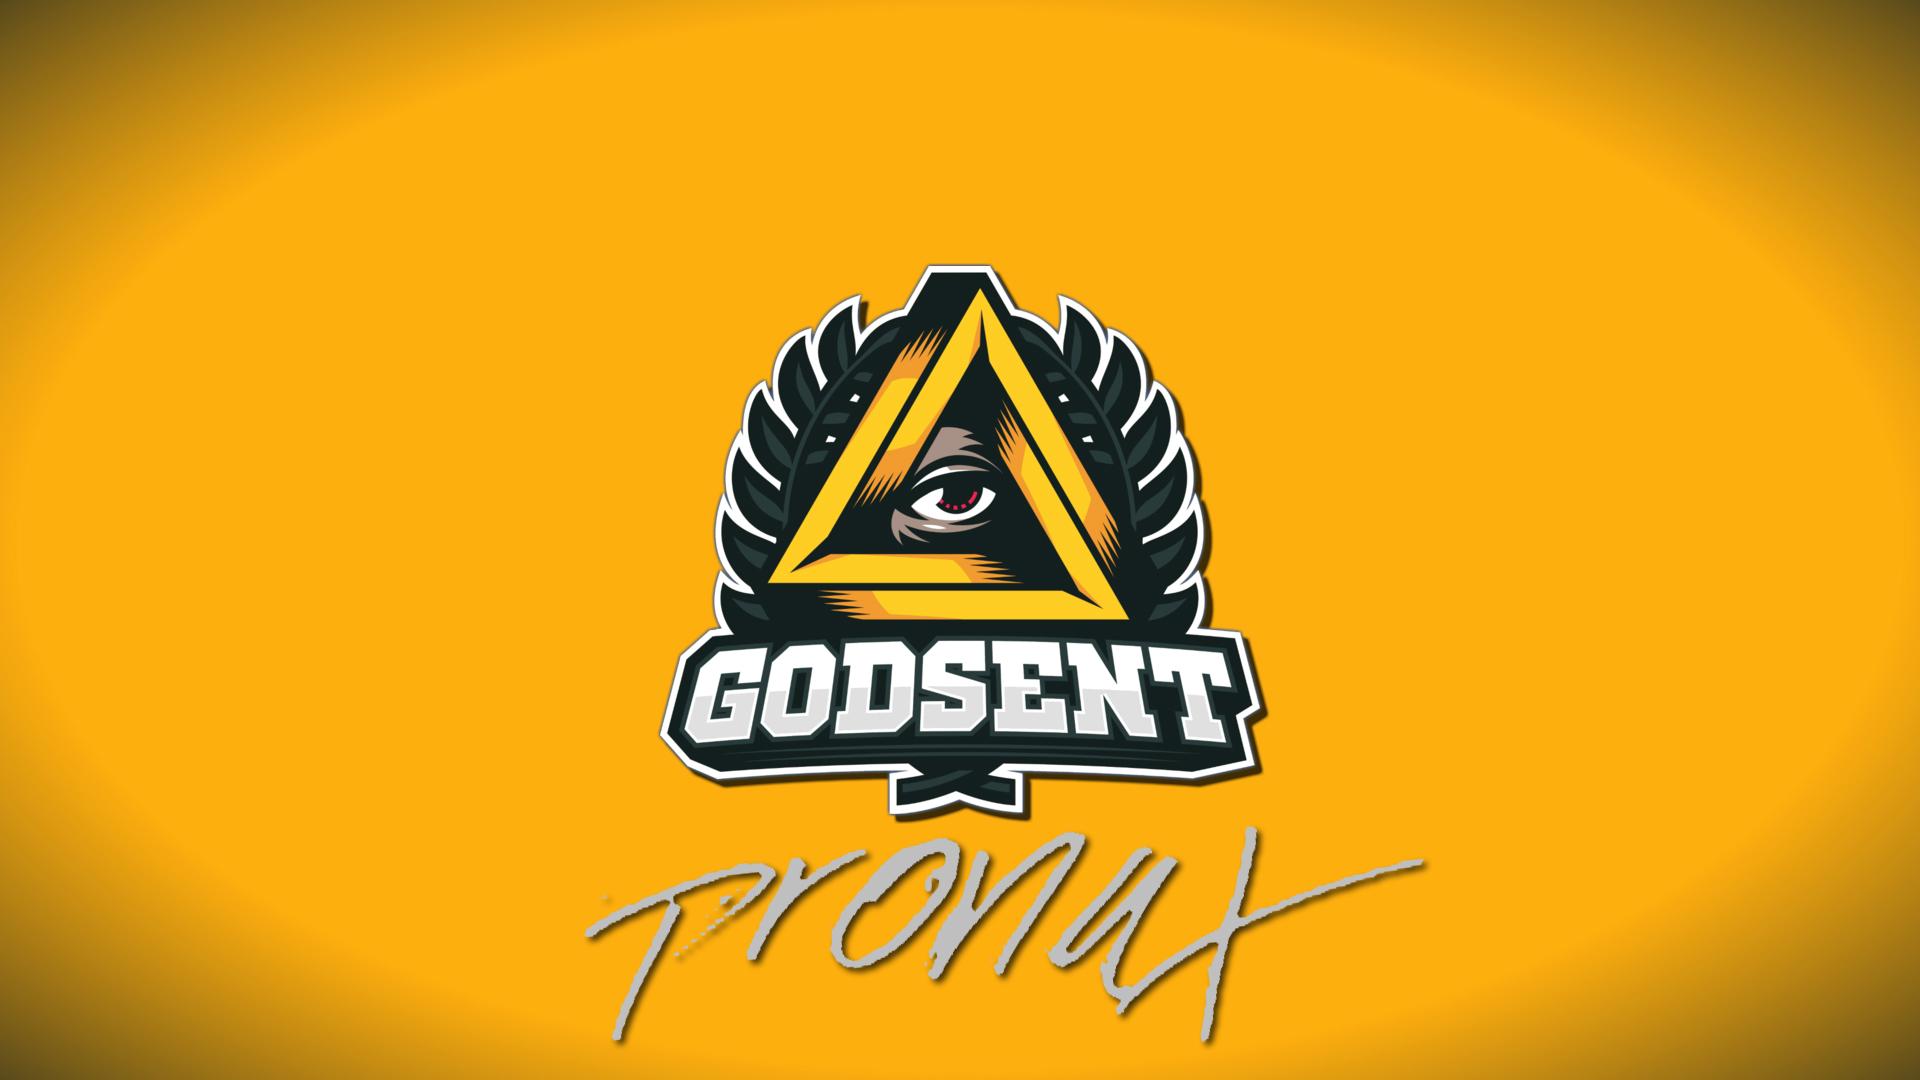 Godsent Simple Pronax